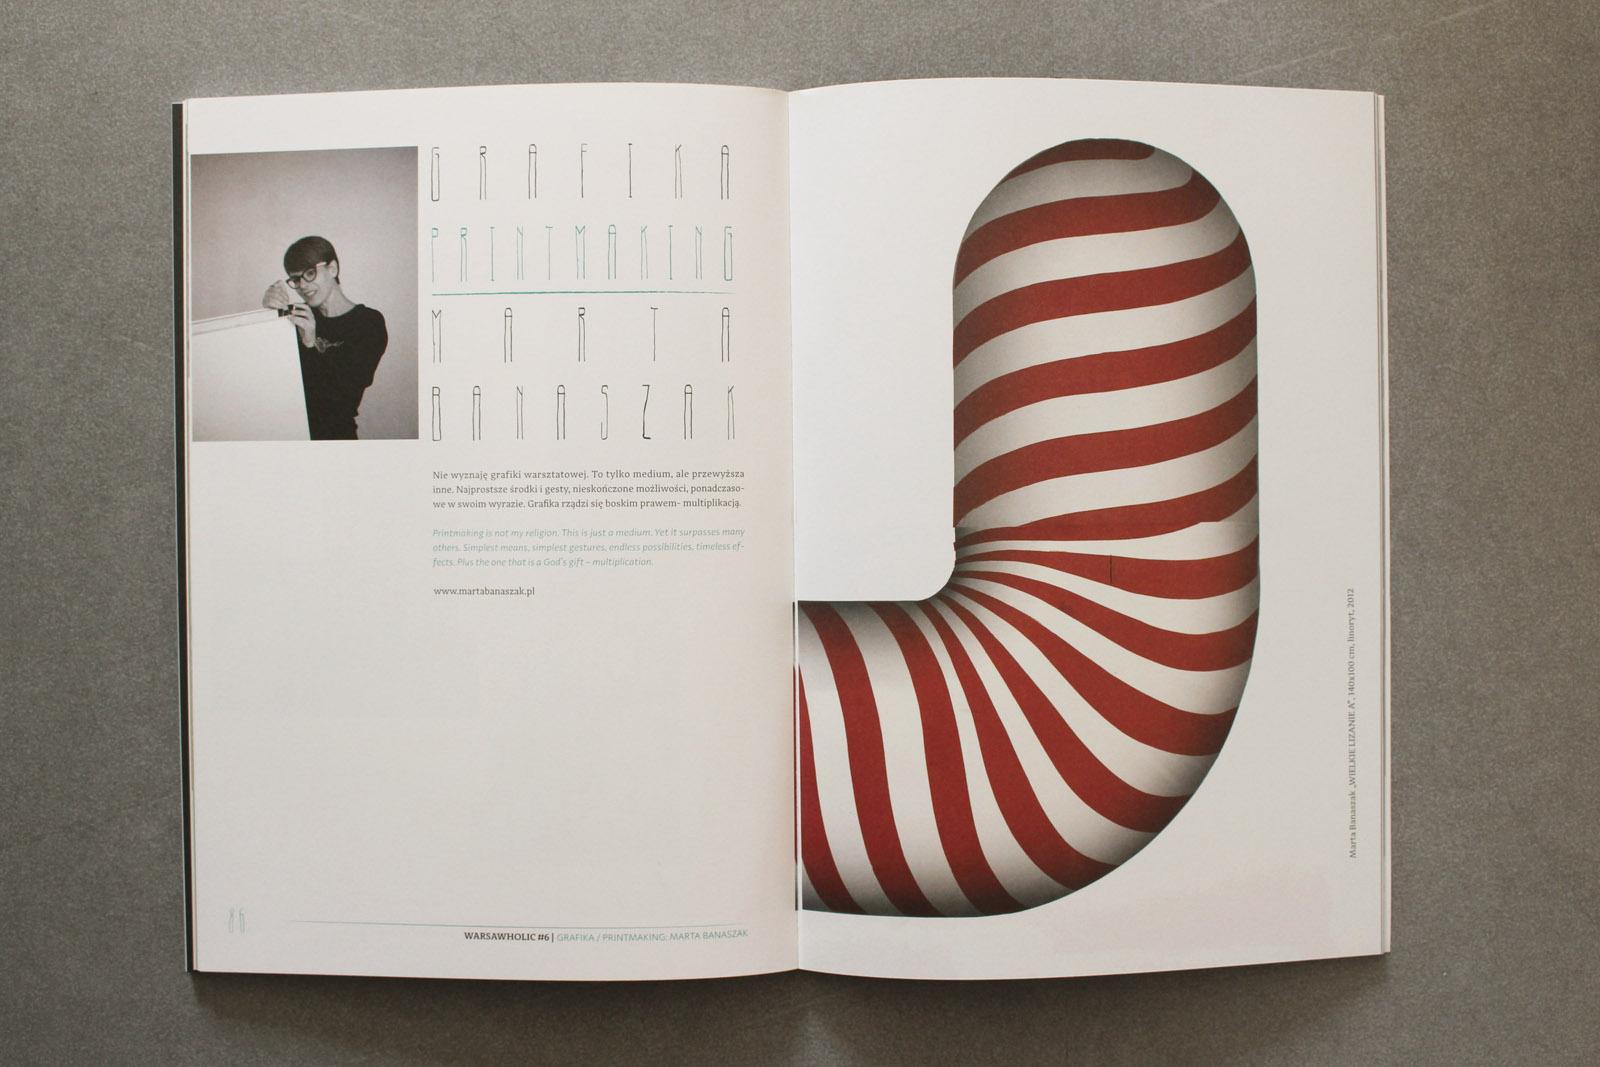 THE GREAT LICKING linocut_Warsawholic Magazine